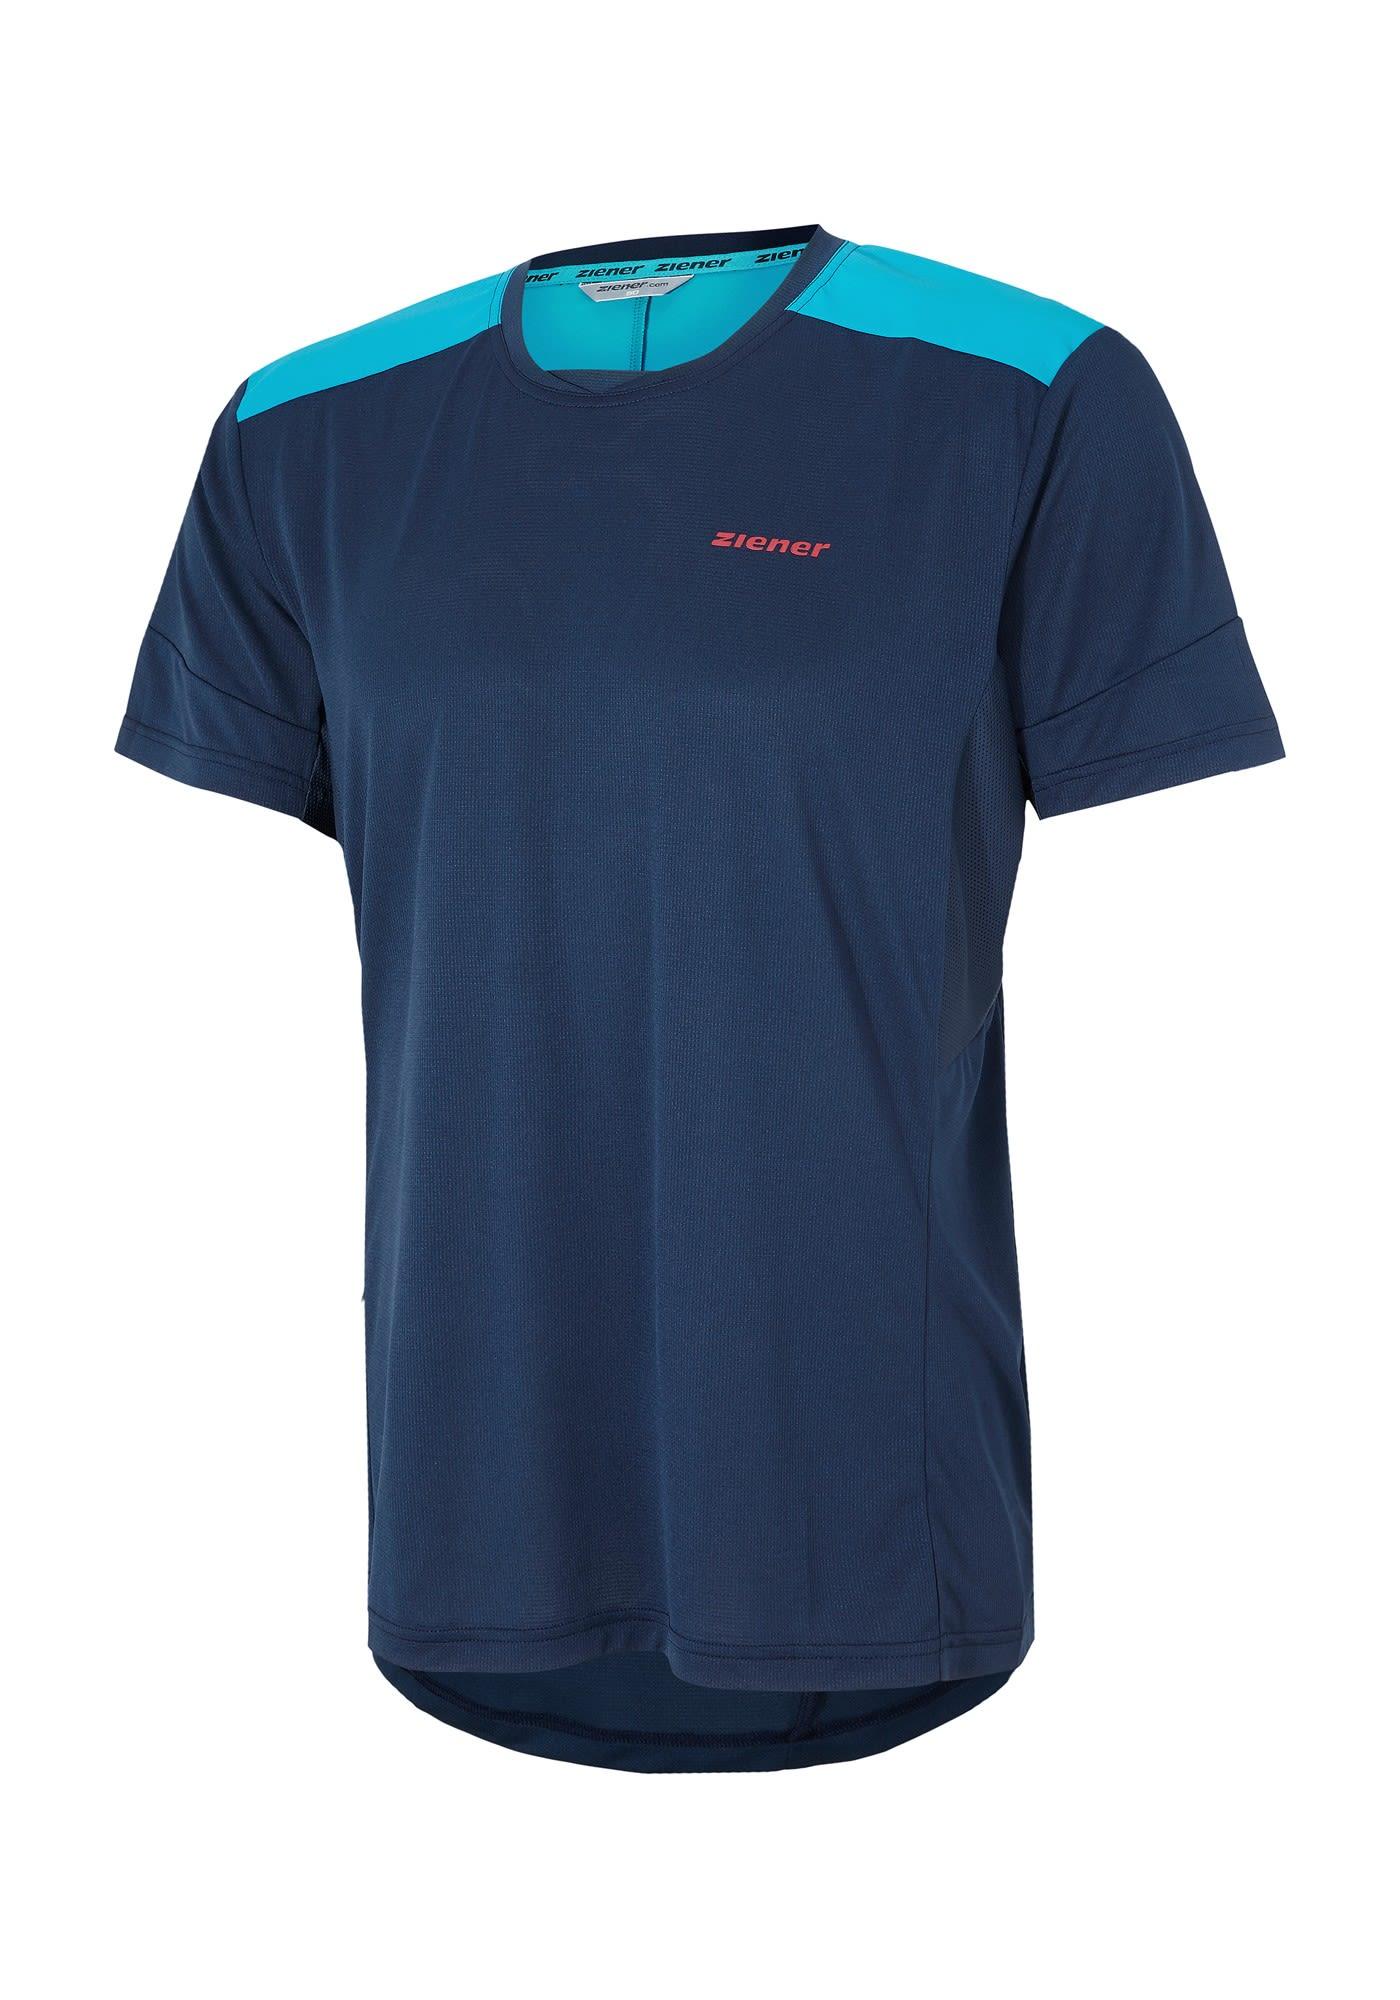 Ziener Nevyo Blau, Male Kurzarm-Shirt, 52